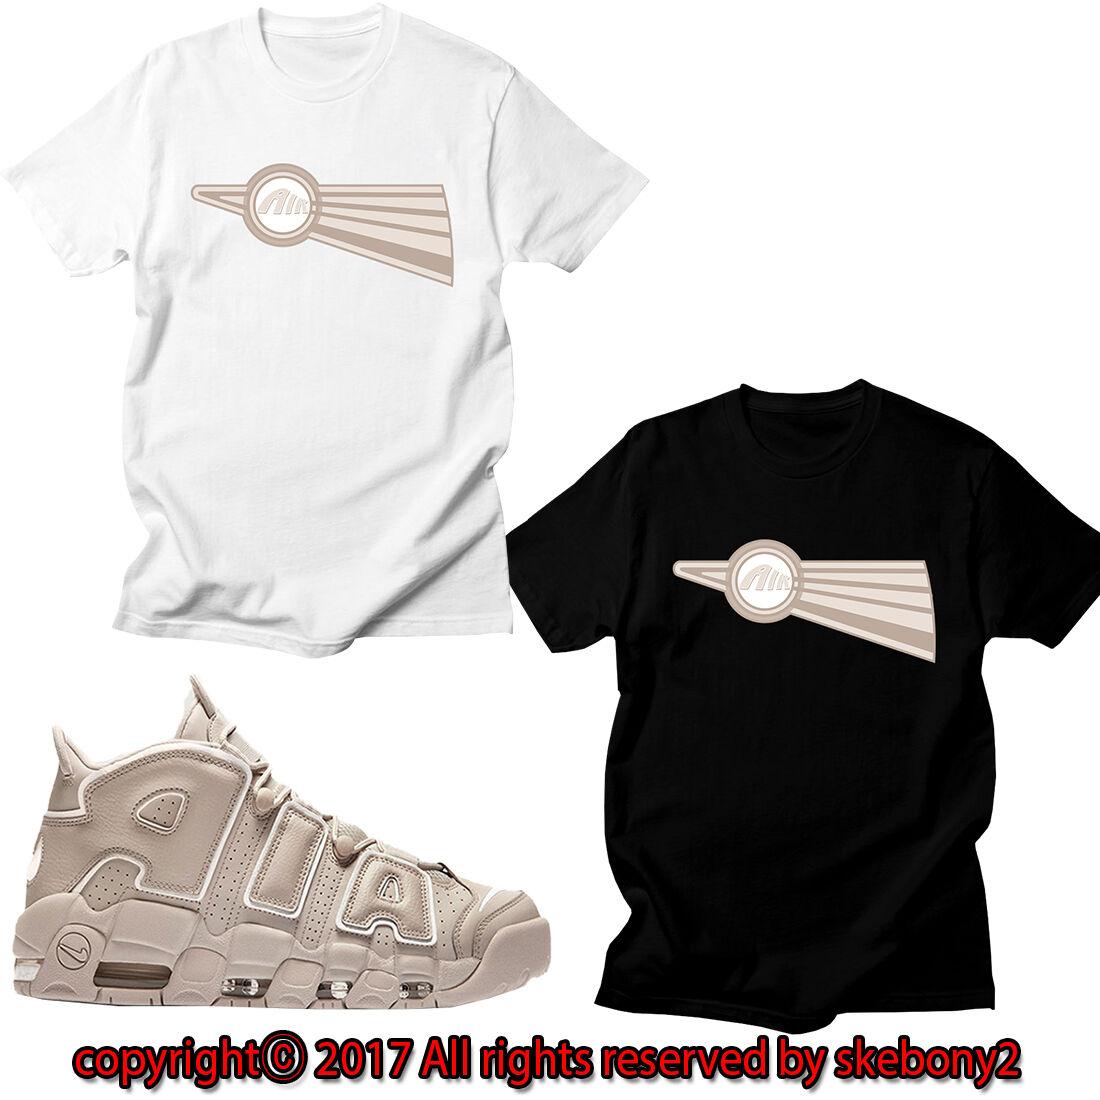 ae74e49ae NEW CUSTOM TEE Nike Air More Uptempo matching T SHIRT UTP 1-10-1 Light Bone  · image